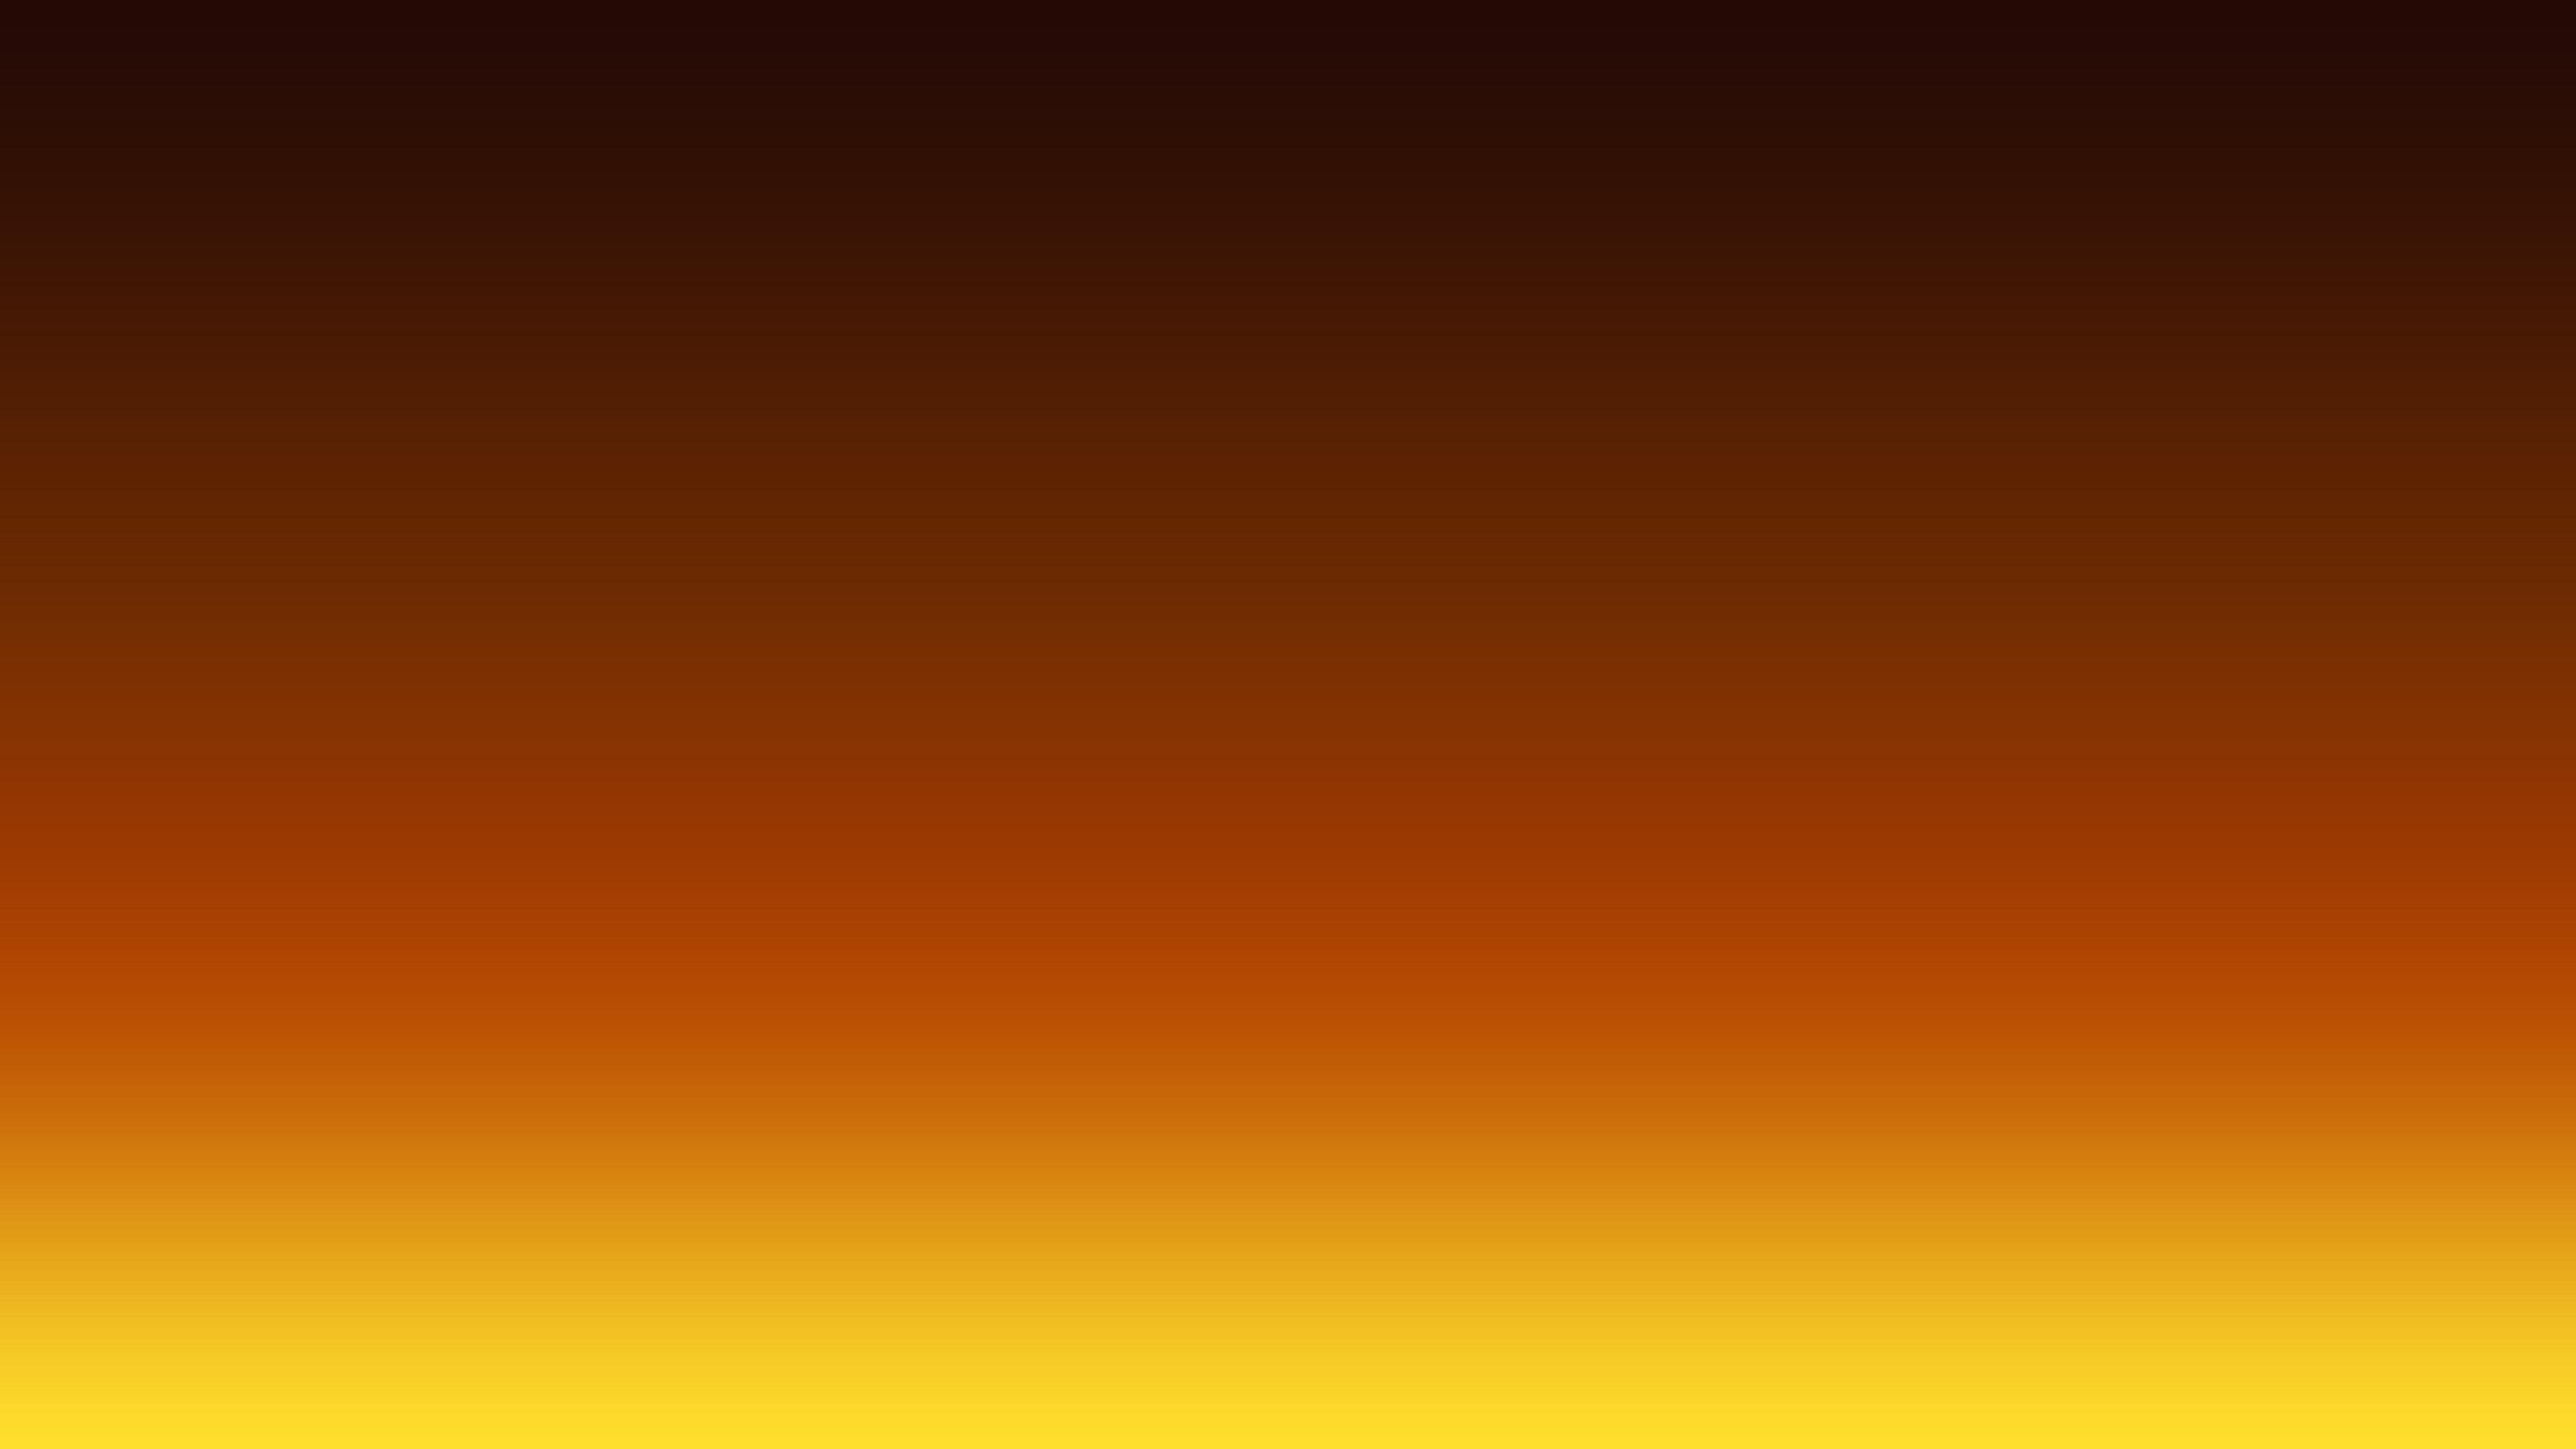 gradient orange warm blur 1546277886 - Gradient Orange Warm Blur - orange wallpapers, hd-wallpapers, gradient wallpapers, digital art wallpapers, blur wallpapers, artwork wallpapers, artist wallpapers